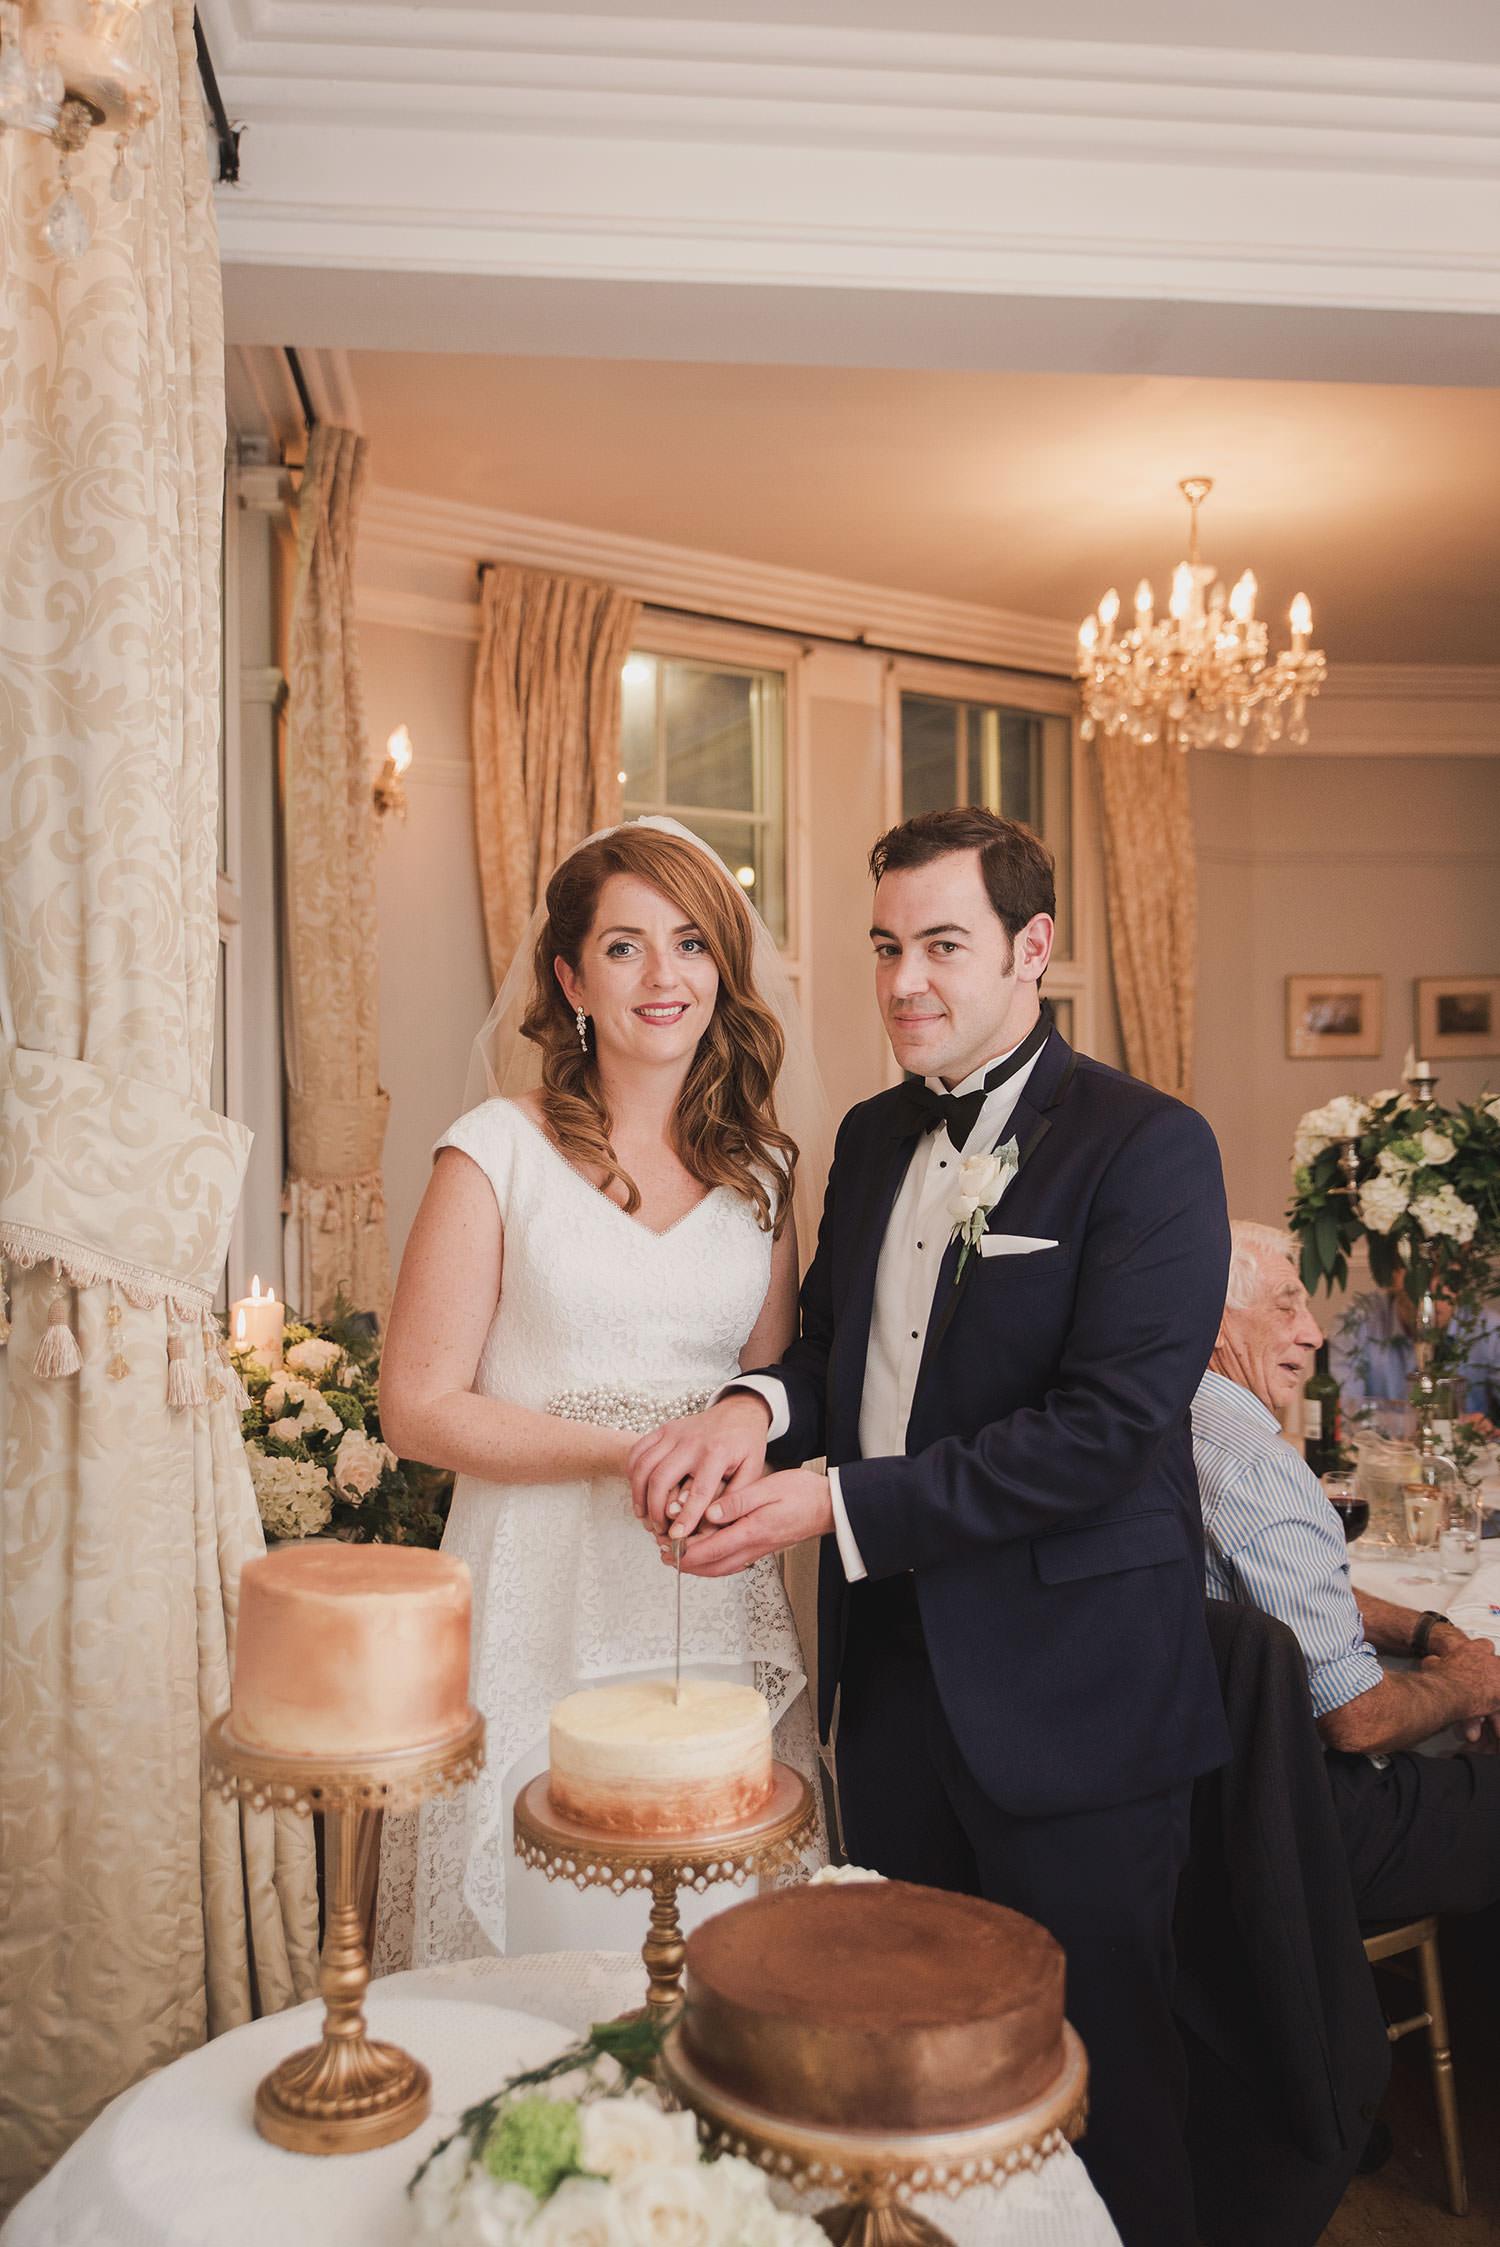 dunraven-arms-wedding-photography-137.jpg